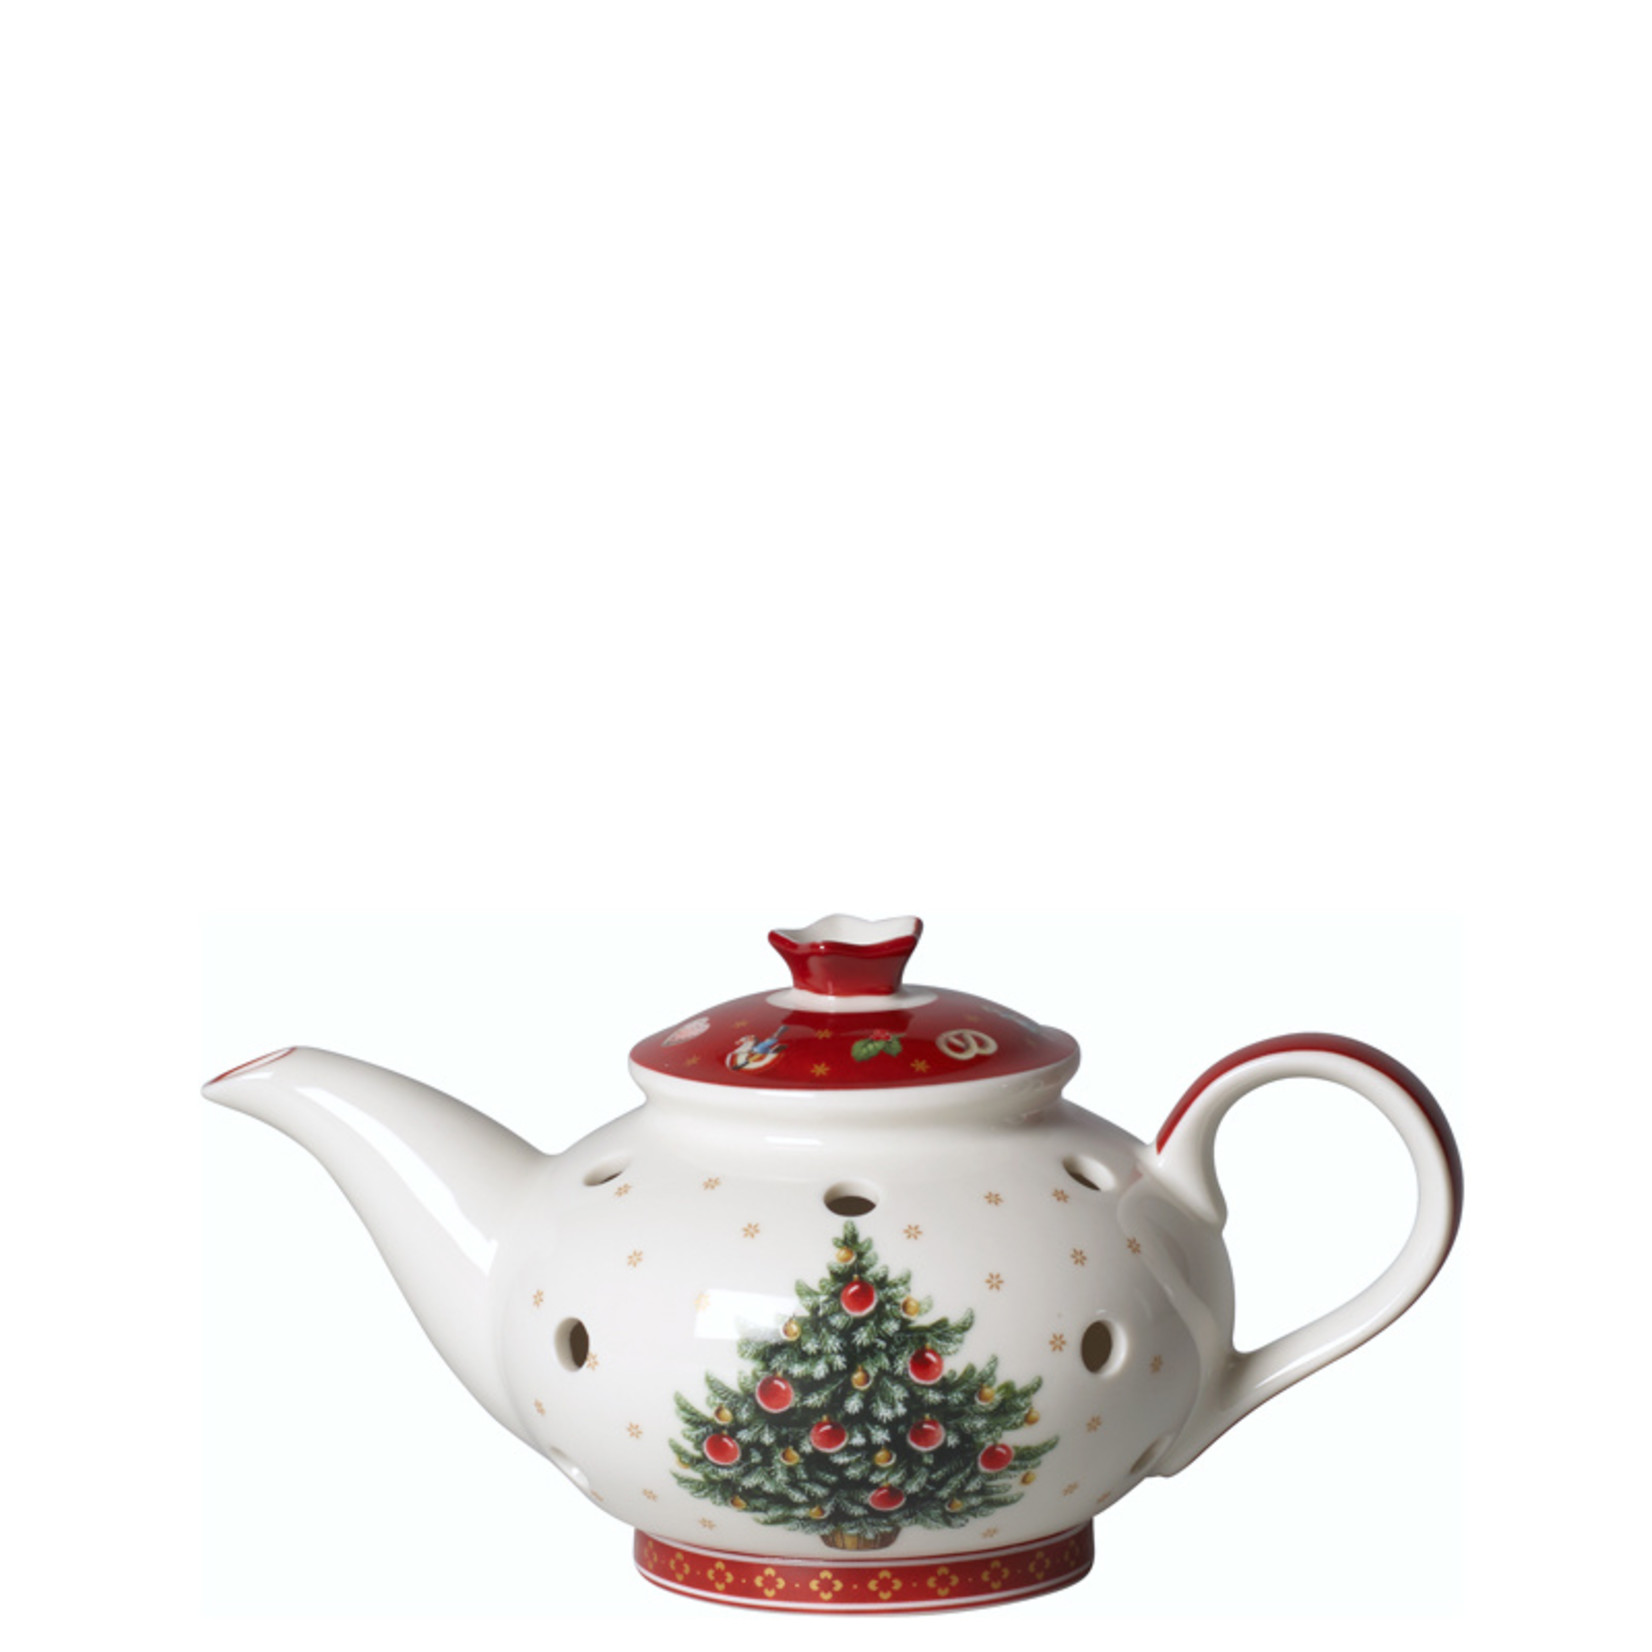 Villeroy & Boch  Teelichthalter Kaffeekanne   Villeroy & Boch Toy's Delight Decoration